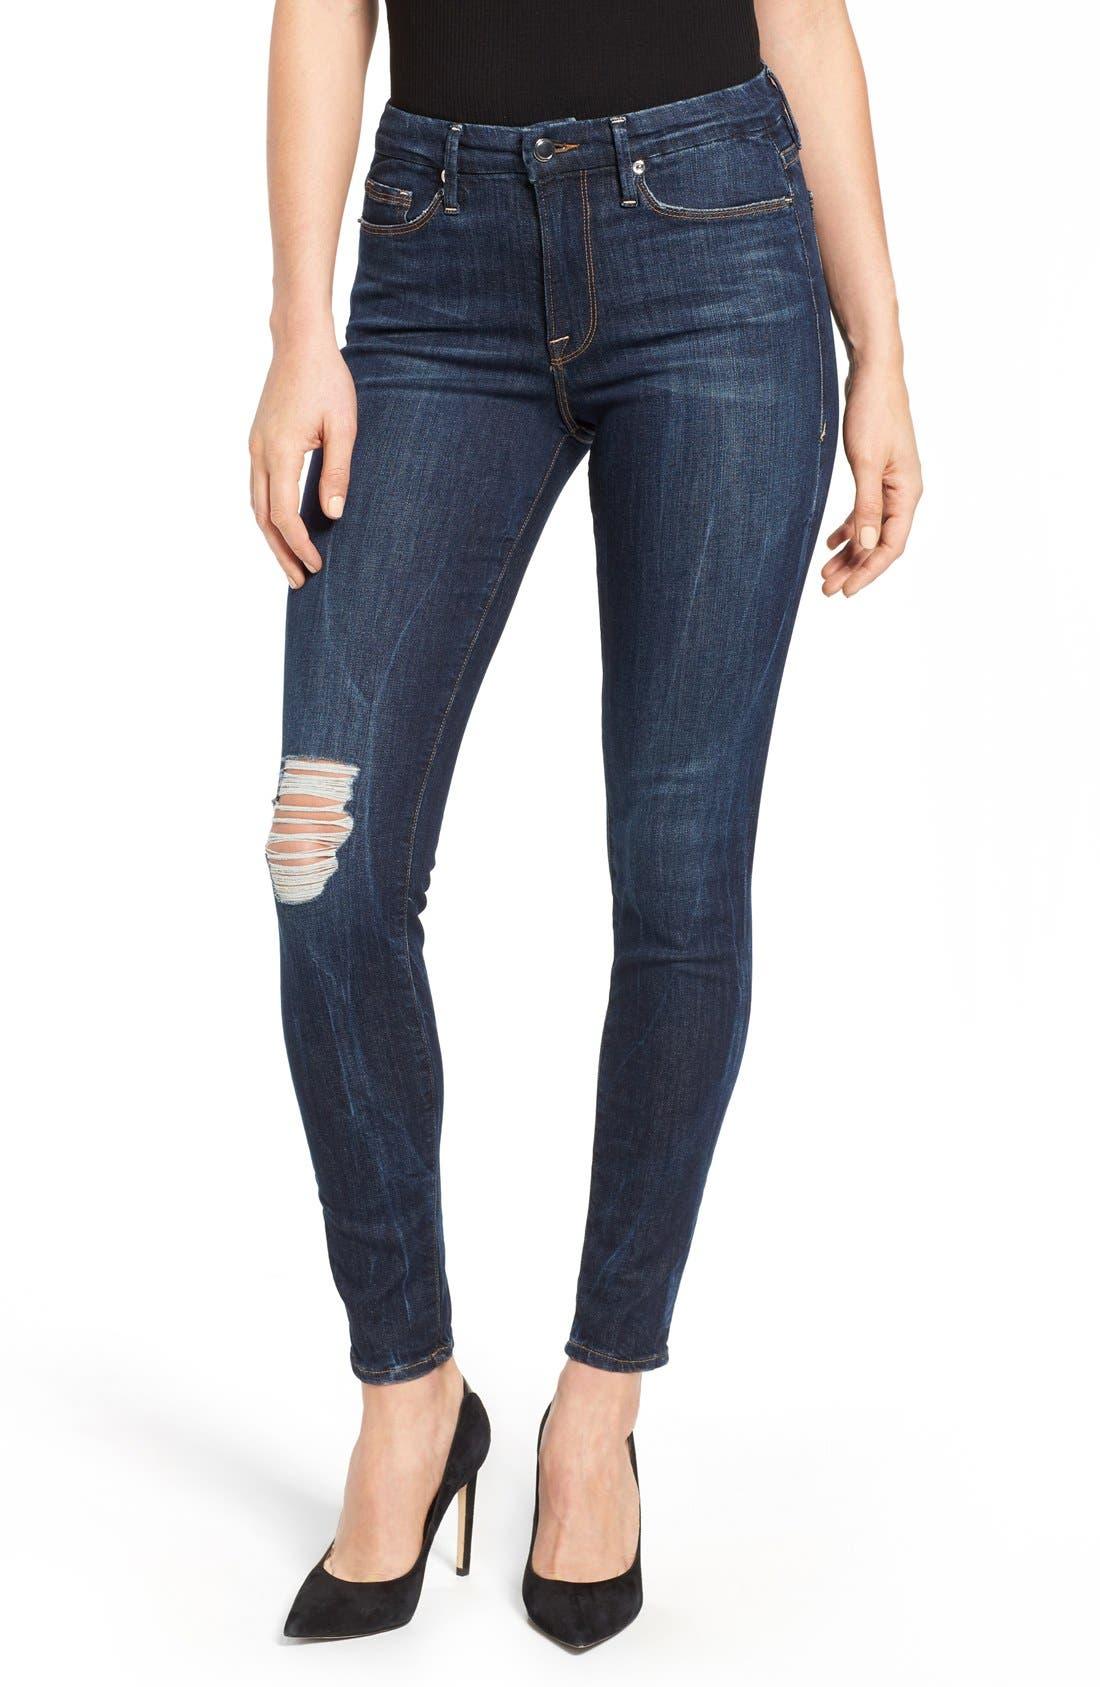 Main Image - Good American Good Legs Ripped Skinny Jeans